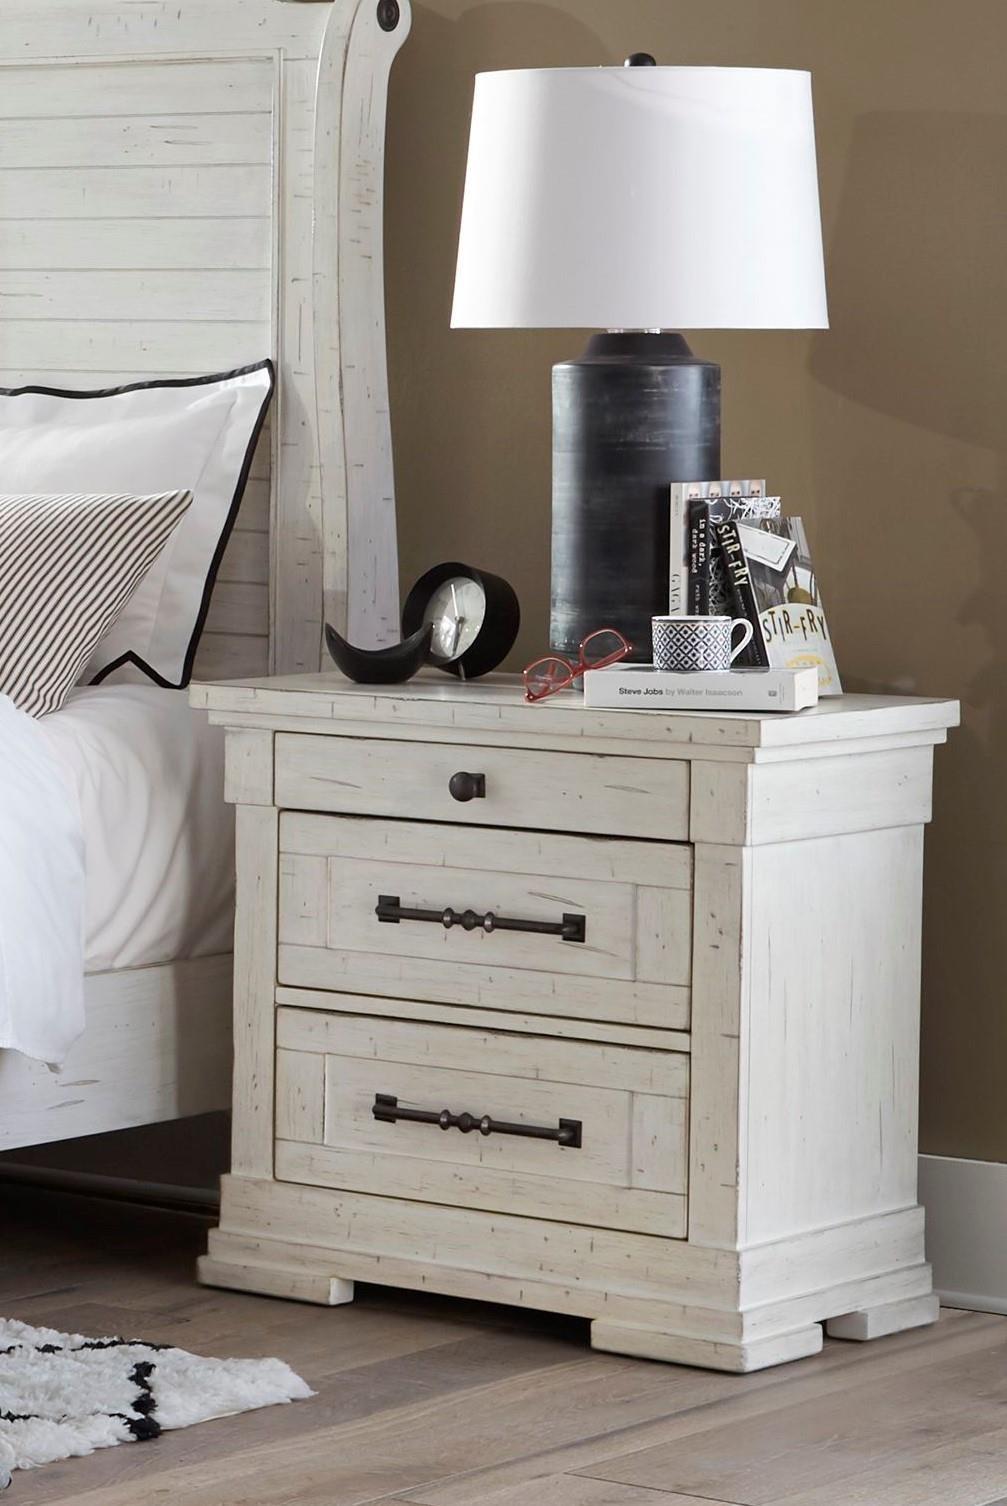 C8047 Three Drawer Nightstand by Lifestyle at Furniture Fair - North Carolina